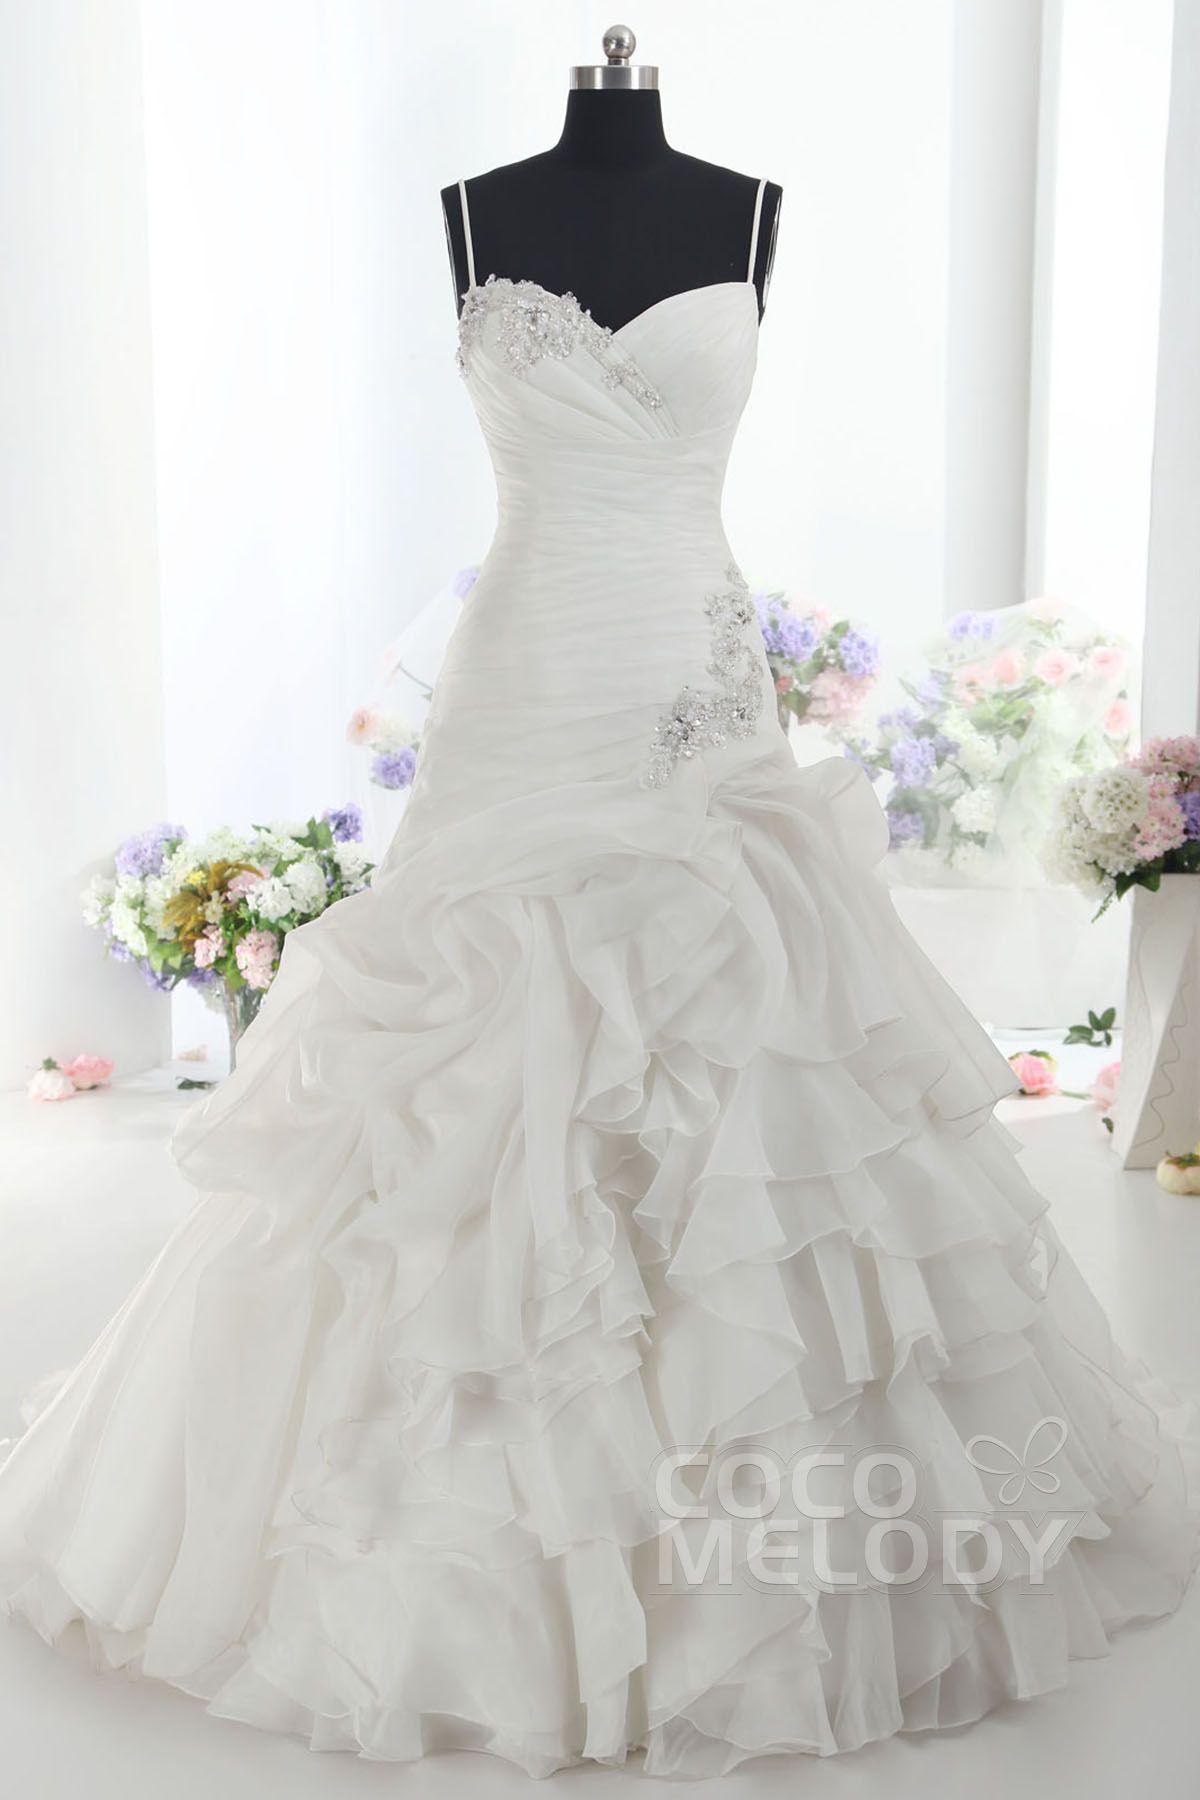 Usd 379 A Line Dropped Train Organza Wedding Dress Ld1099 Drop Waist Wedding Dress Perfect Wedding Dress Ball Gown Wedding Dress [ 1800 x 1200 Pixel ]